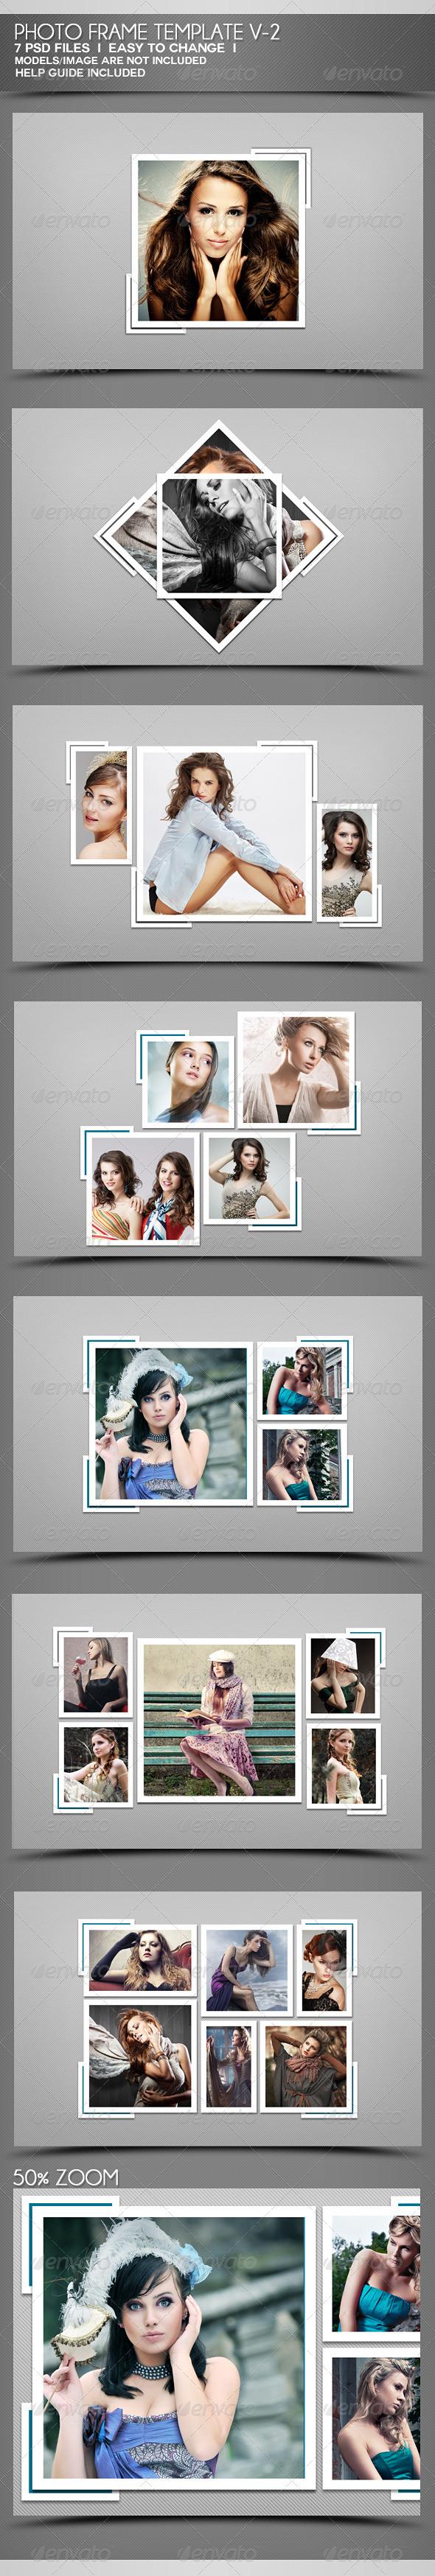 Photo Frame Templates V-2 - Miscellaneous Photo Templates